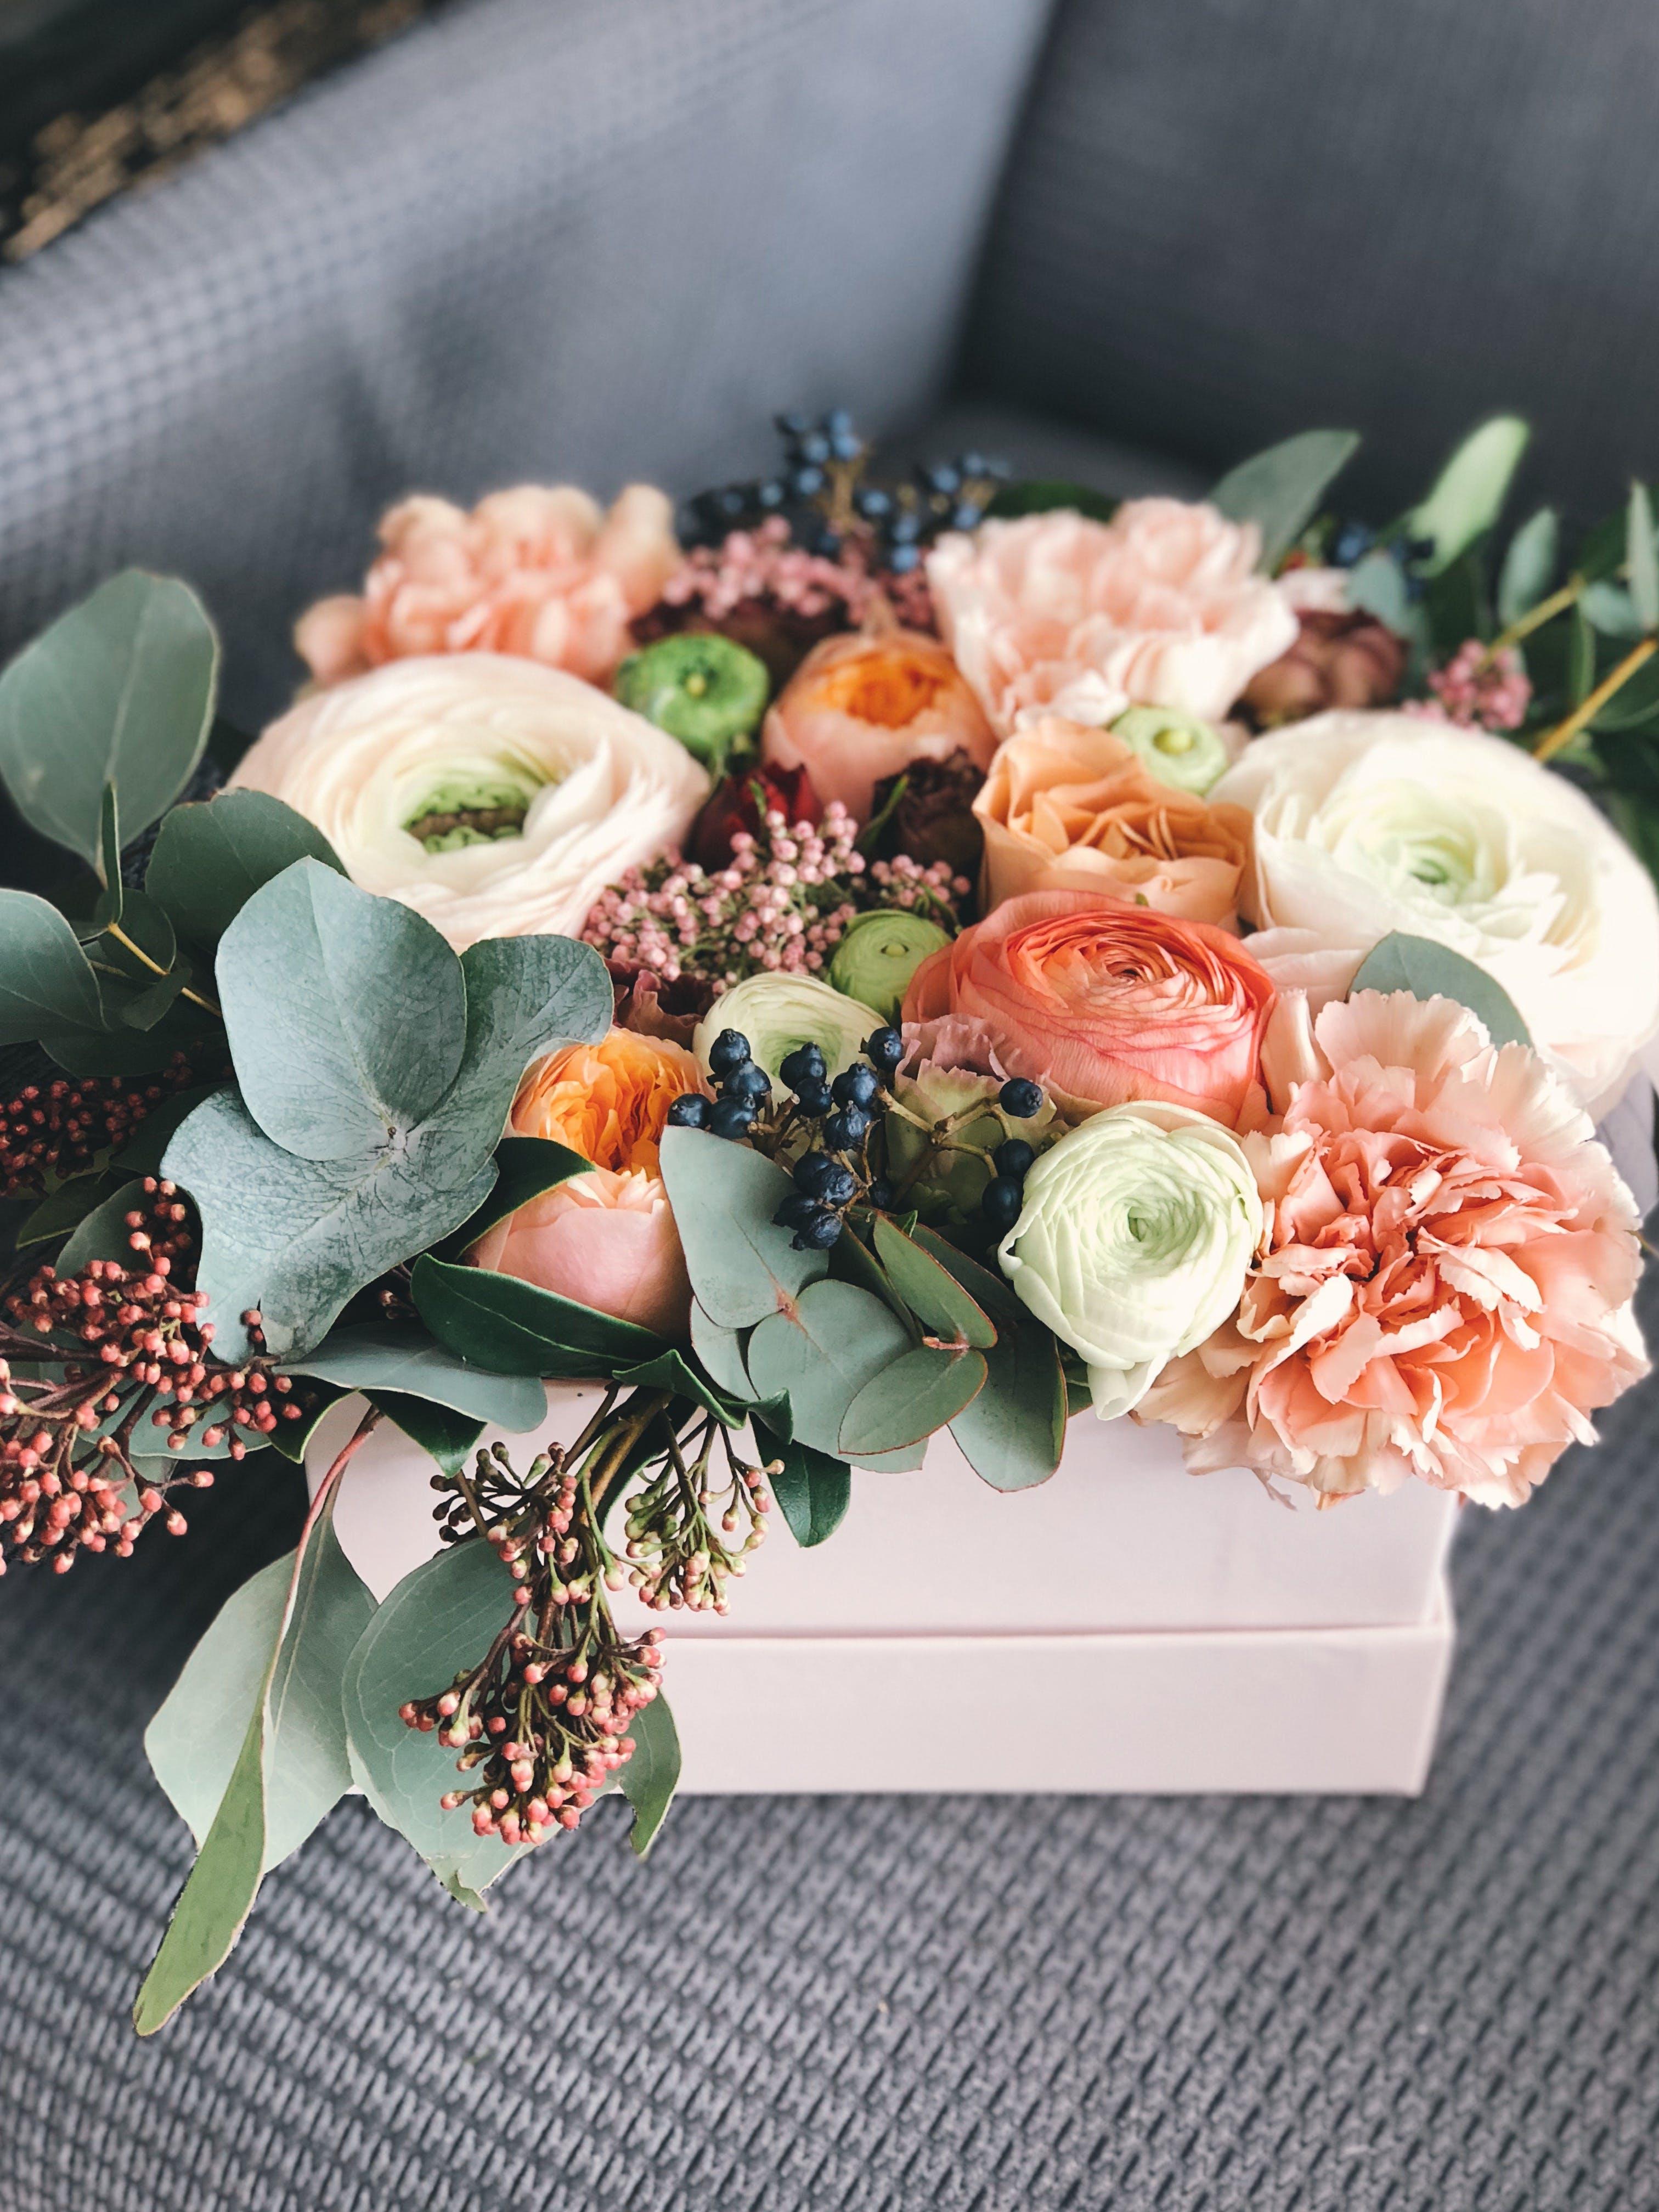 White, Orange, and Green Floral Bouquet Decor